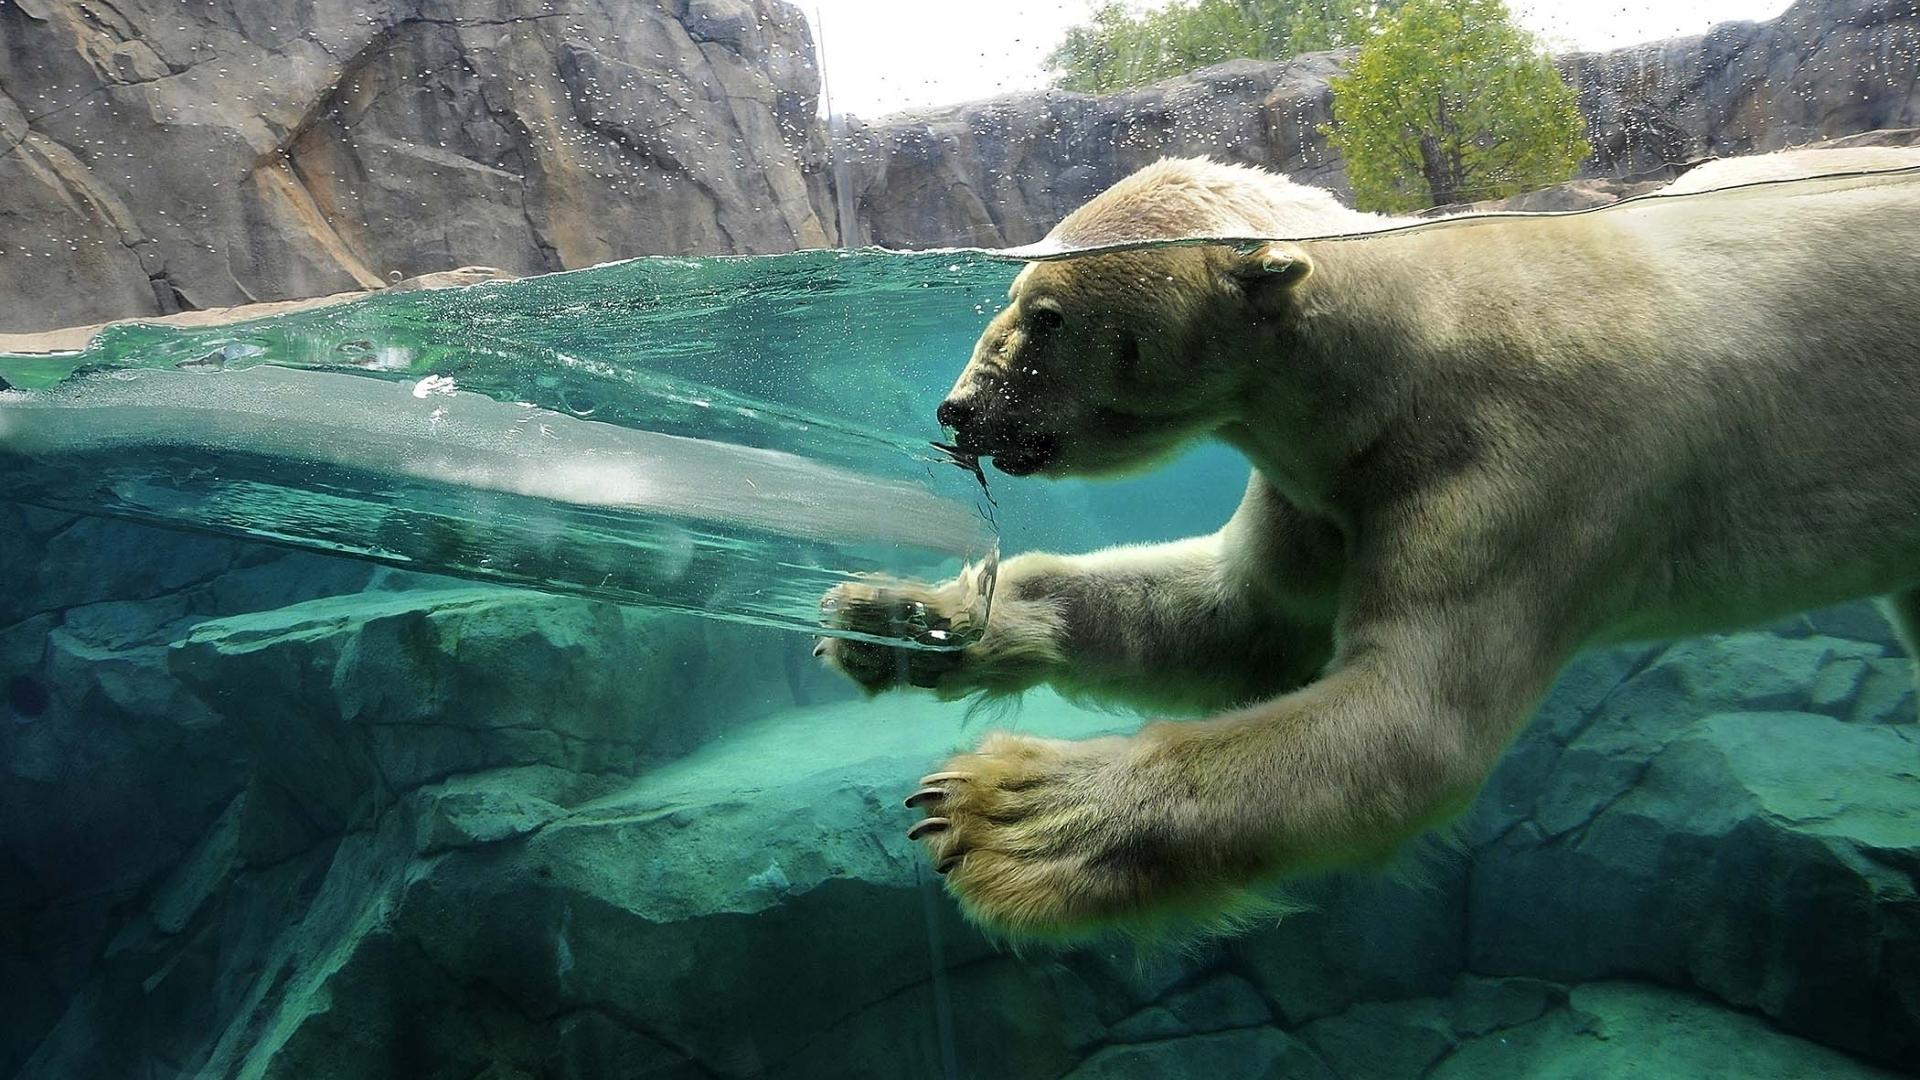 Polar bear swimming in ocean - photo#20